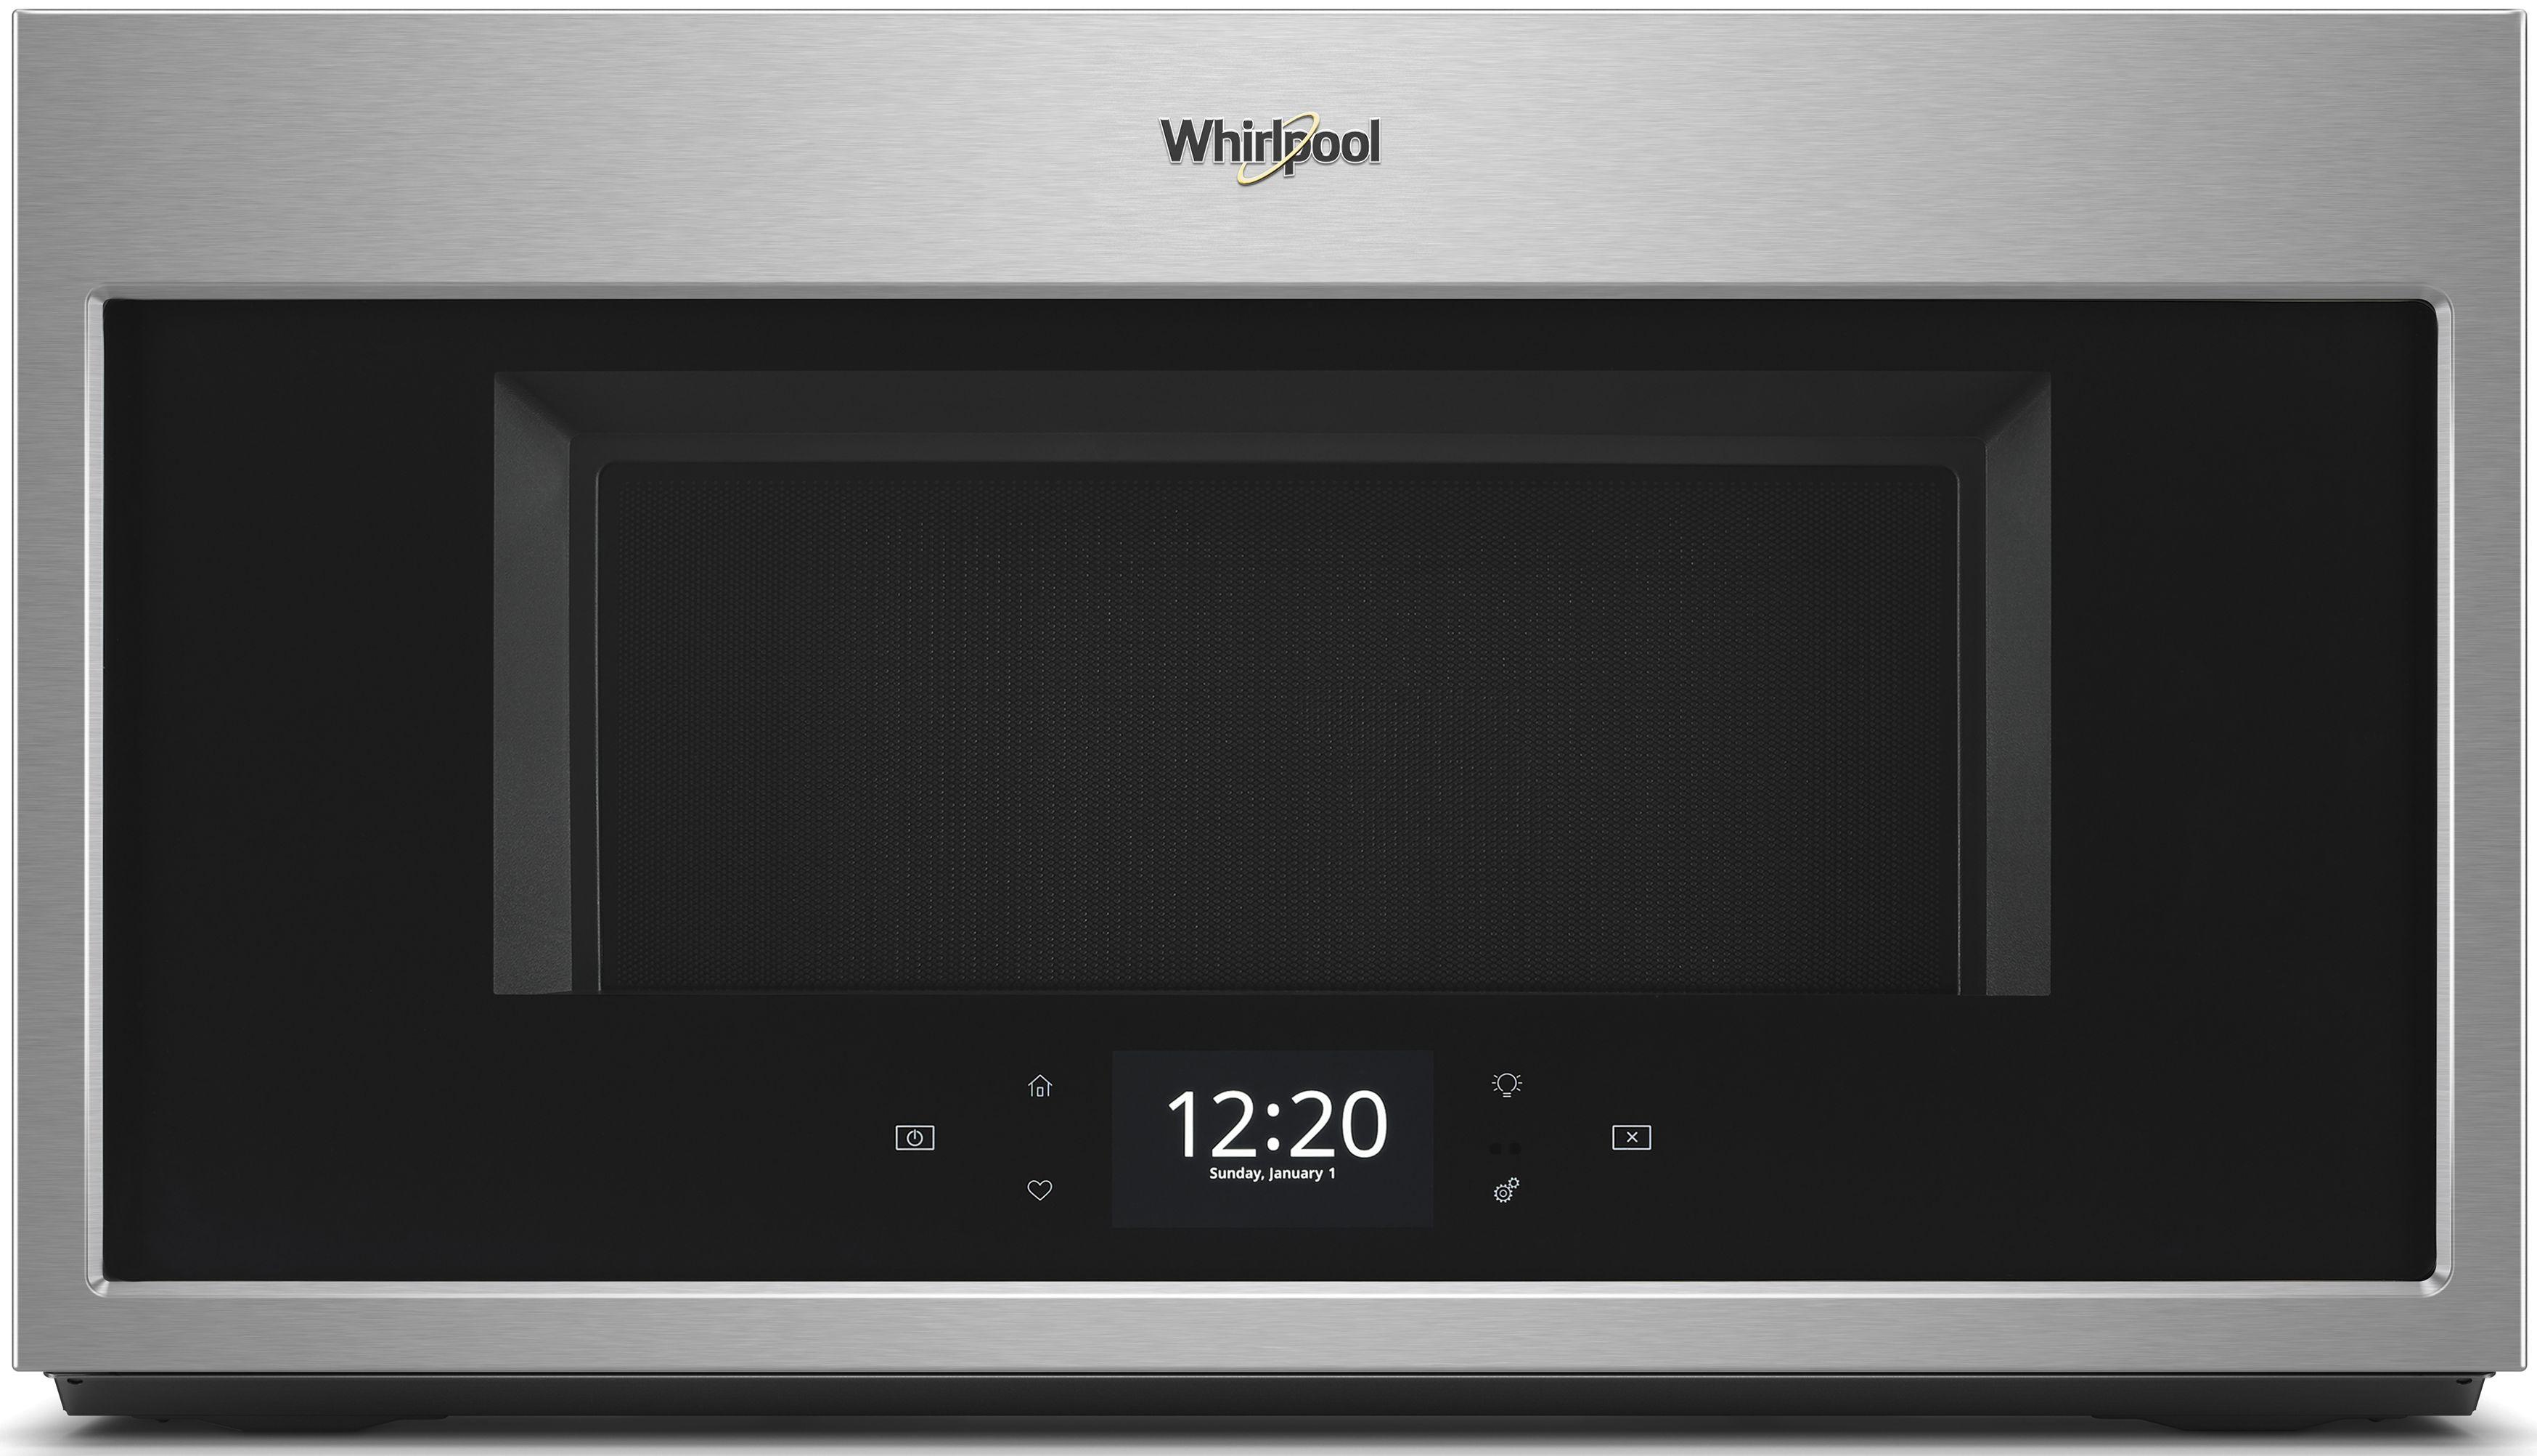 Whirlpool Over The Range Microwave Fingerprint Resistant Stainless Steel Wmha9019hz